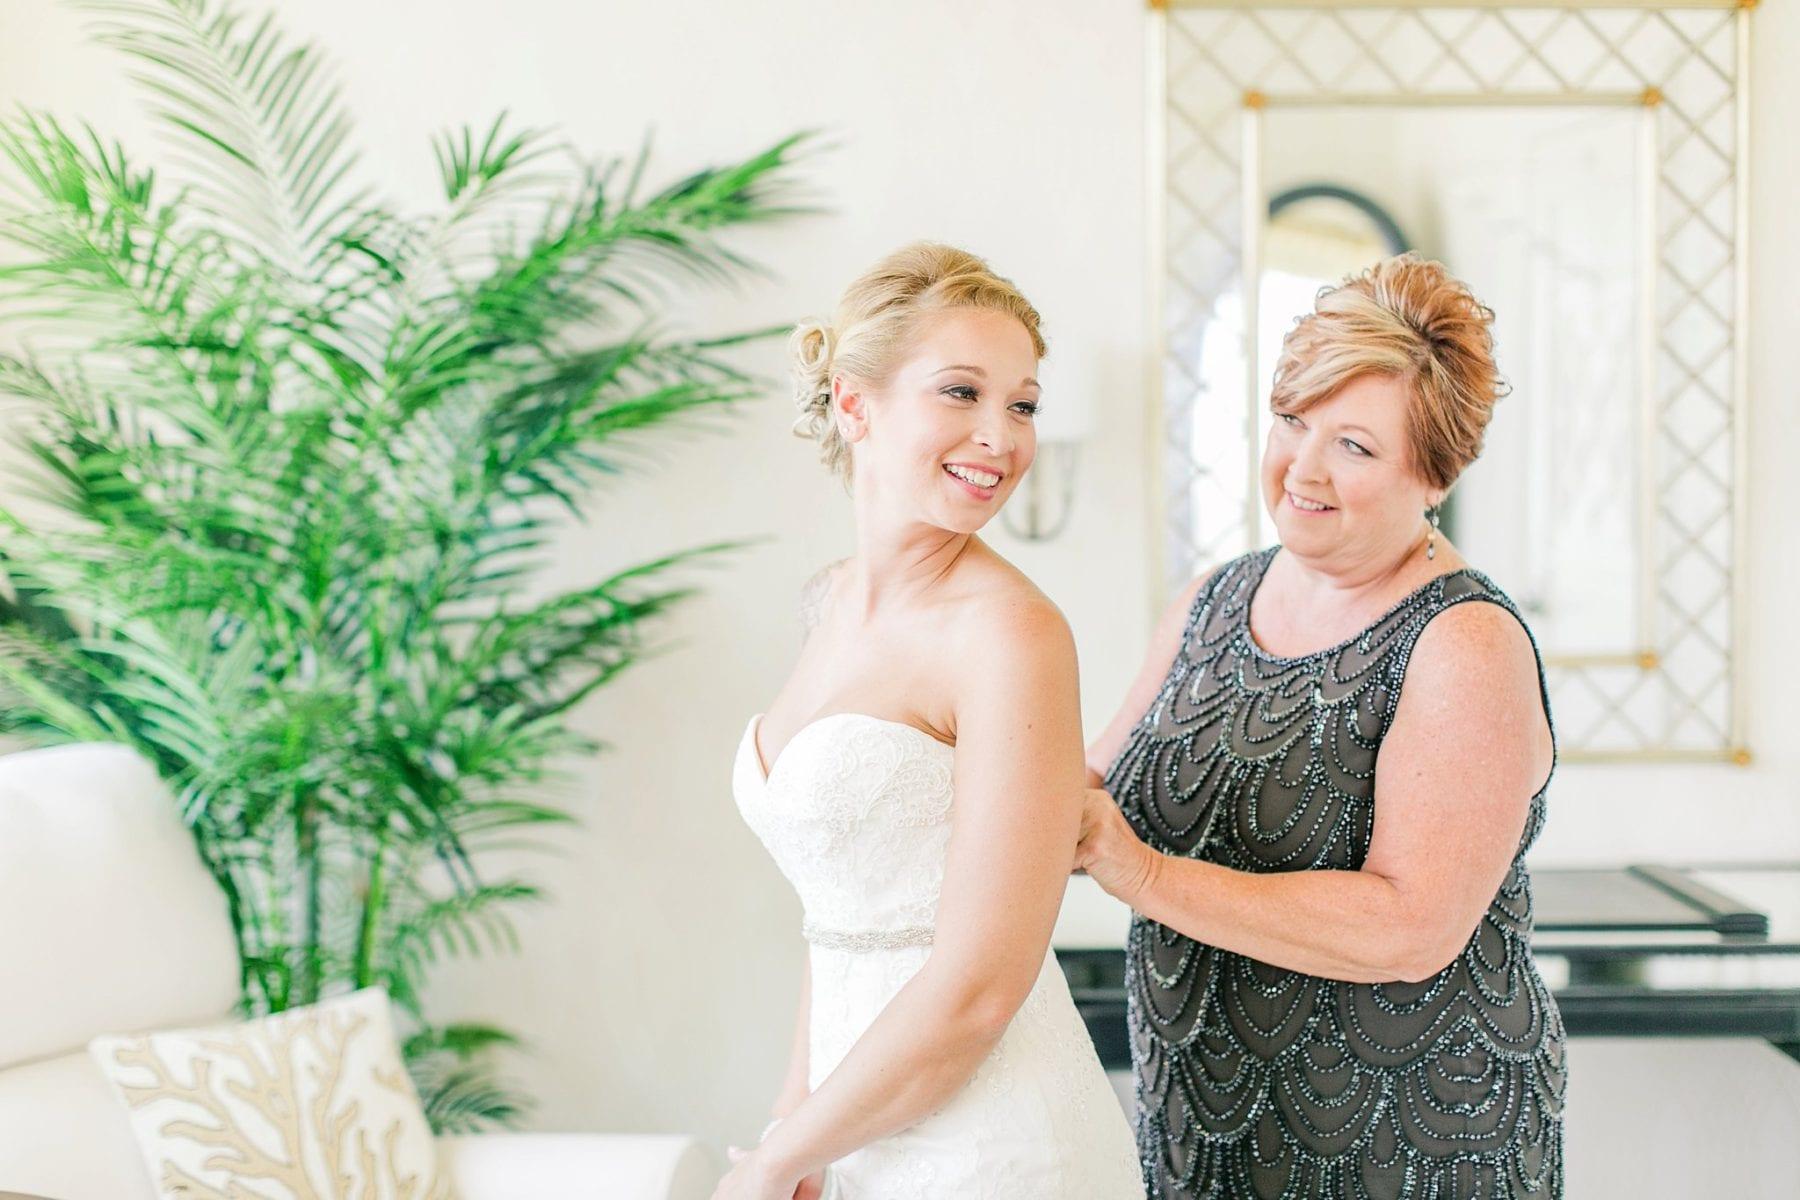 Waters Edge Wedding Photos Maryland Wedding Photographer Megan Kelsey Photography Katie & Conor-70.JPG